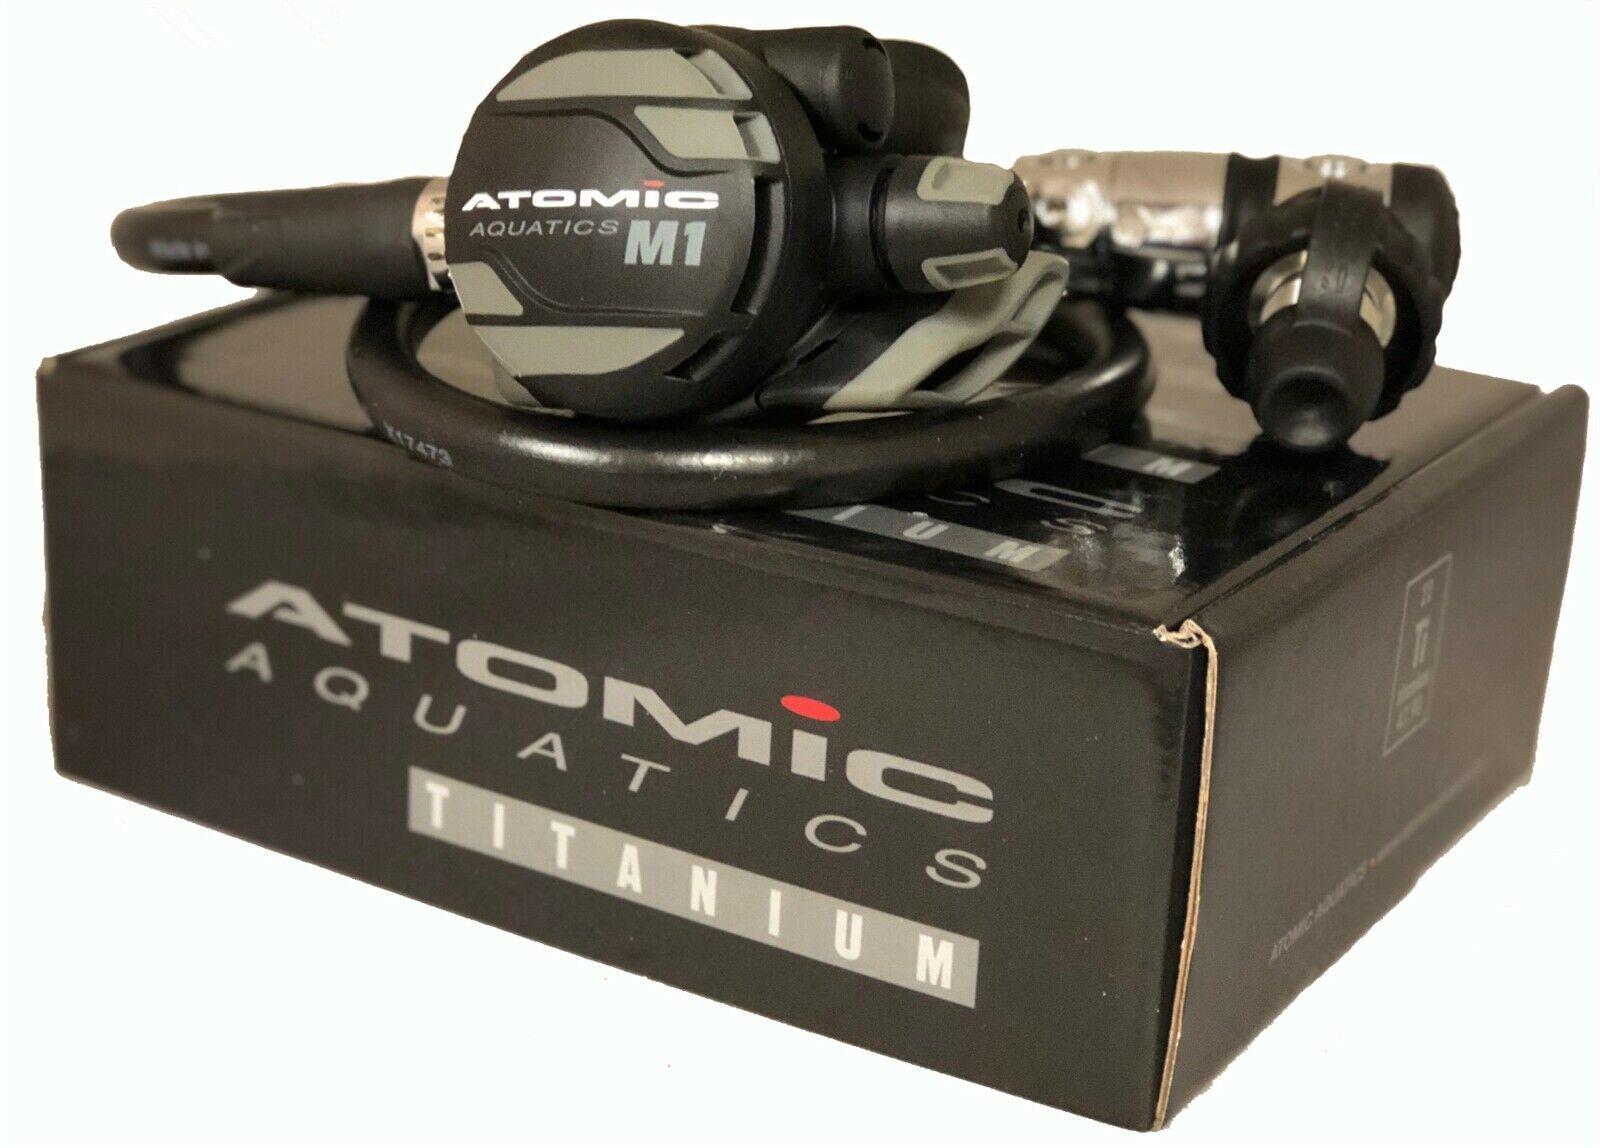 Atomic Aquatics M1 DIN